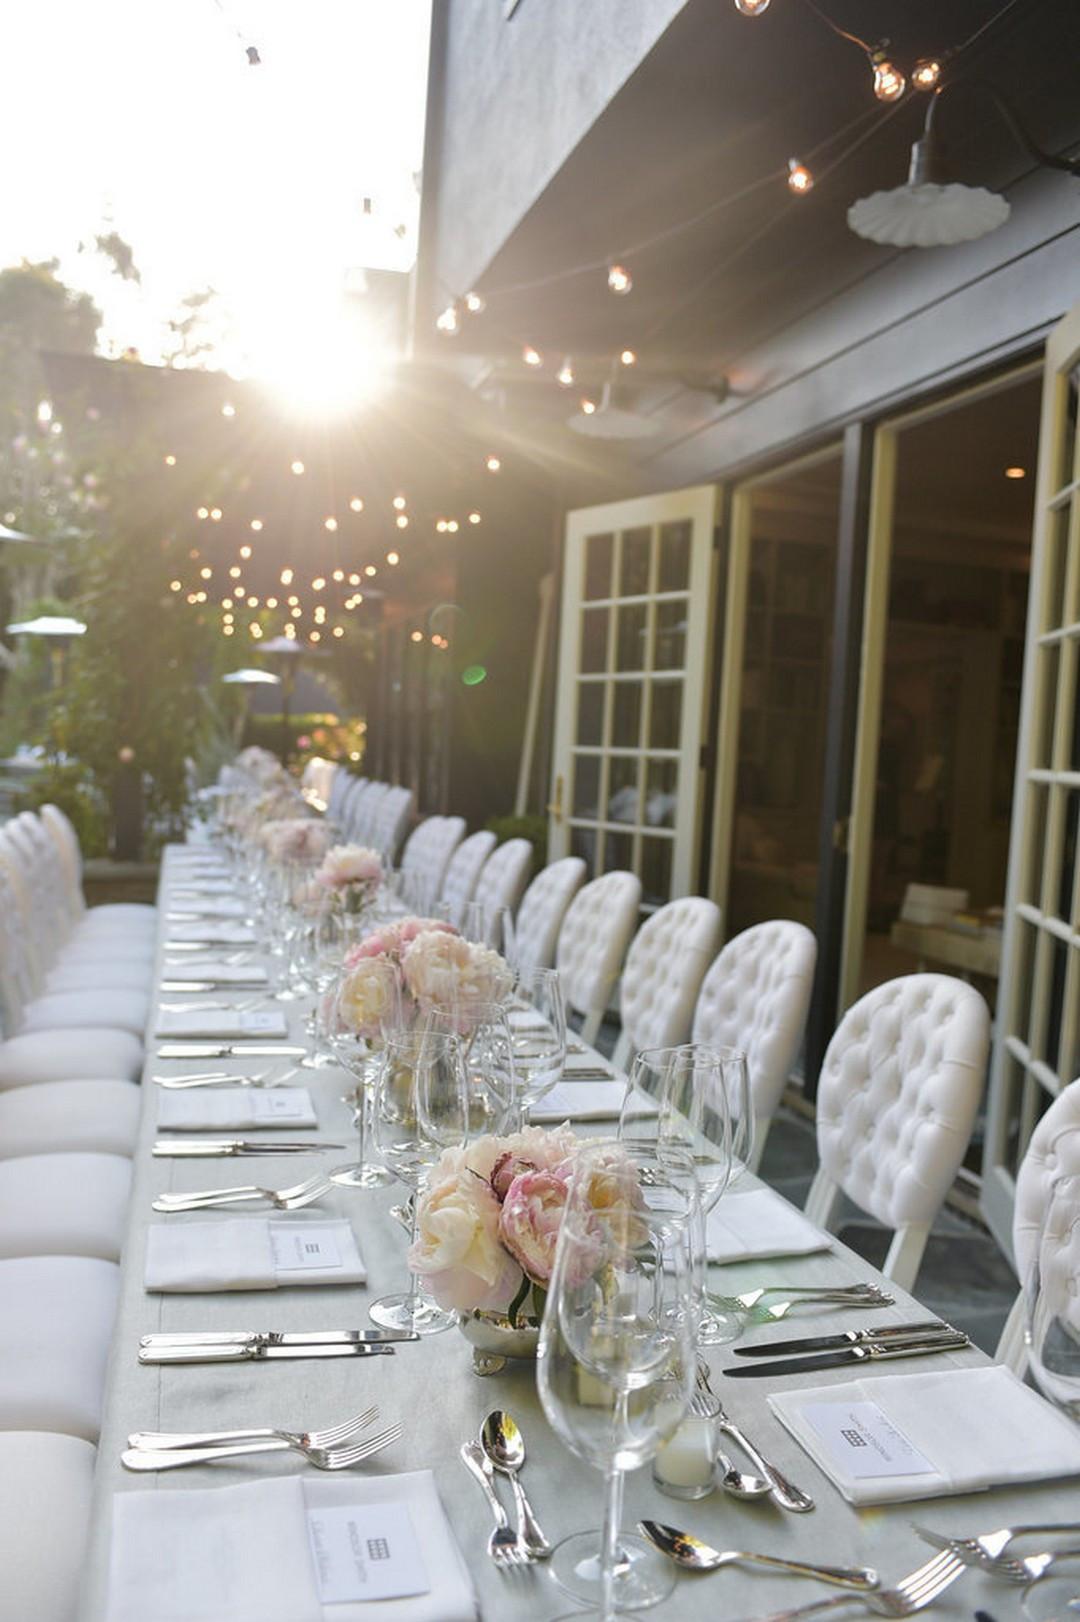 Elegant Engagement Party Ideas  Elegant Wedding Table Settings Ideas 23 echitecture